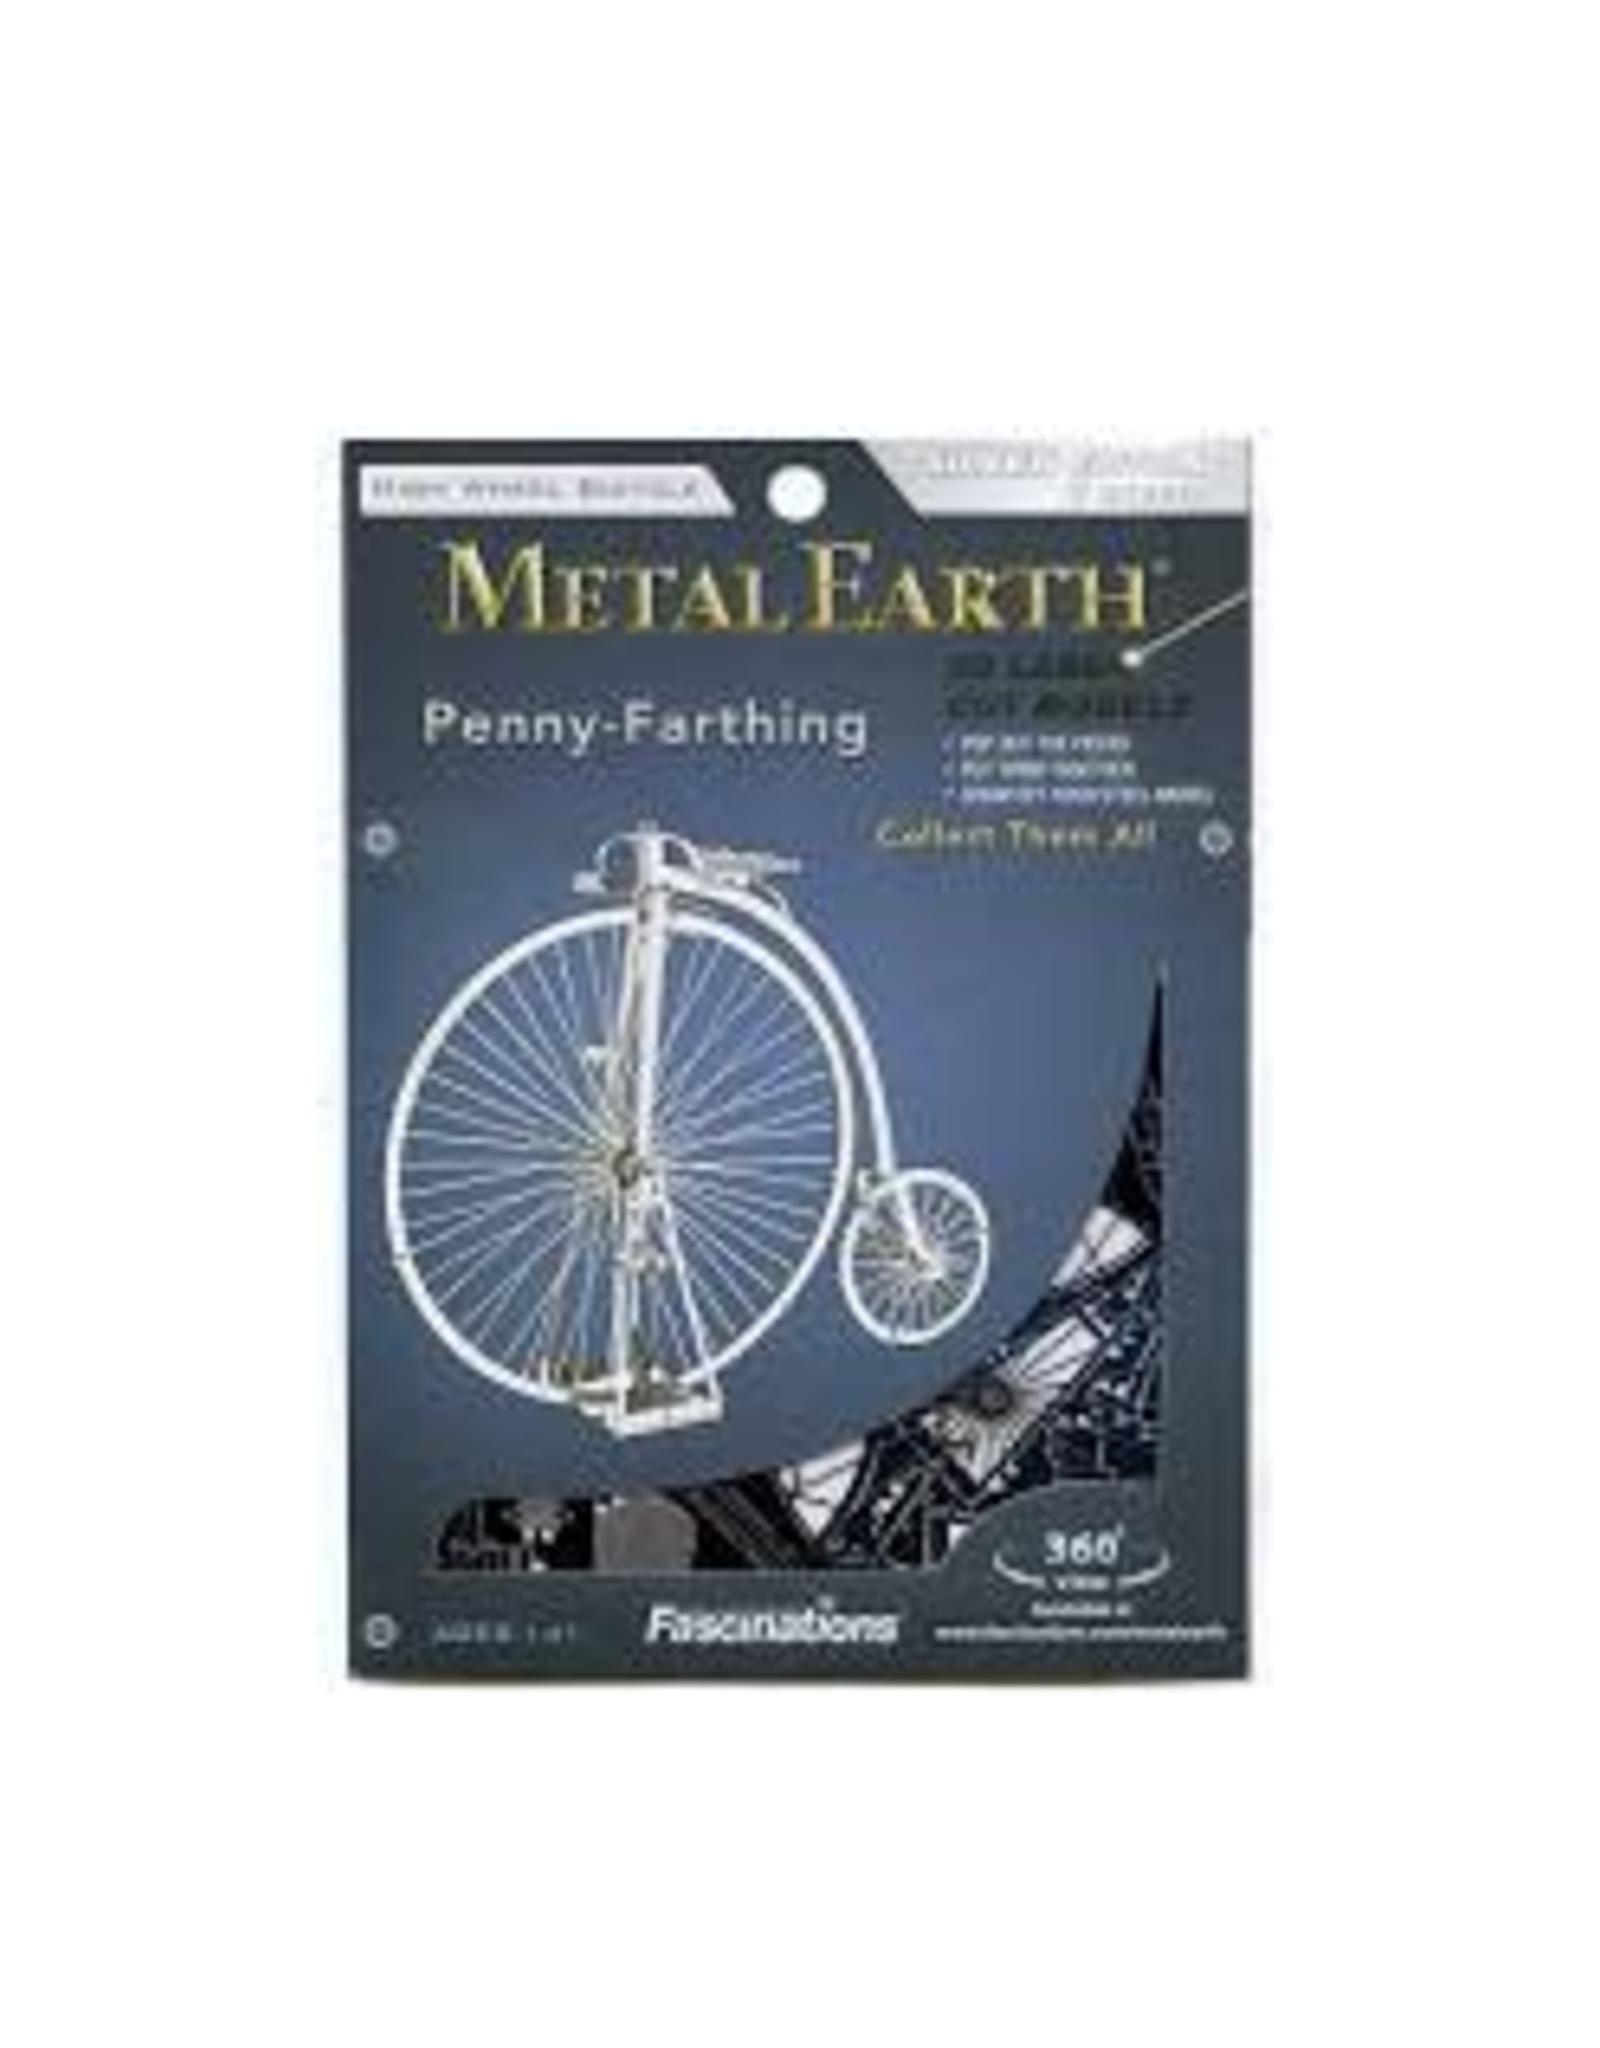 Metal Earth High Wheeled Bicycle